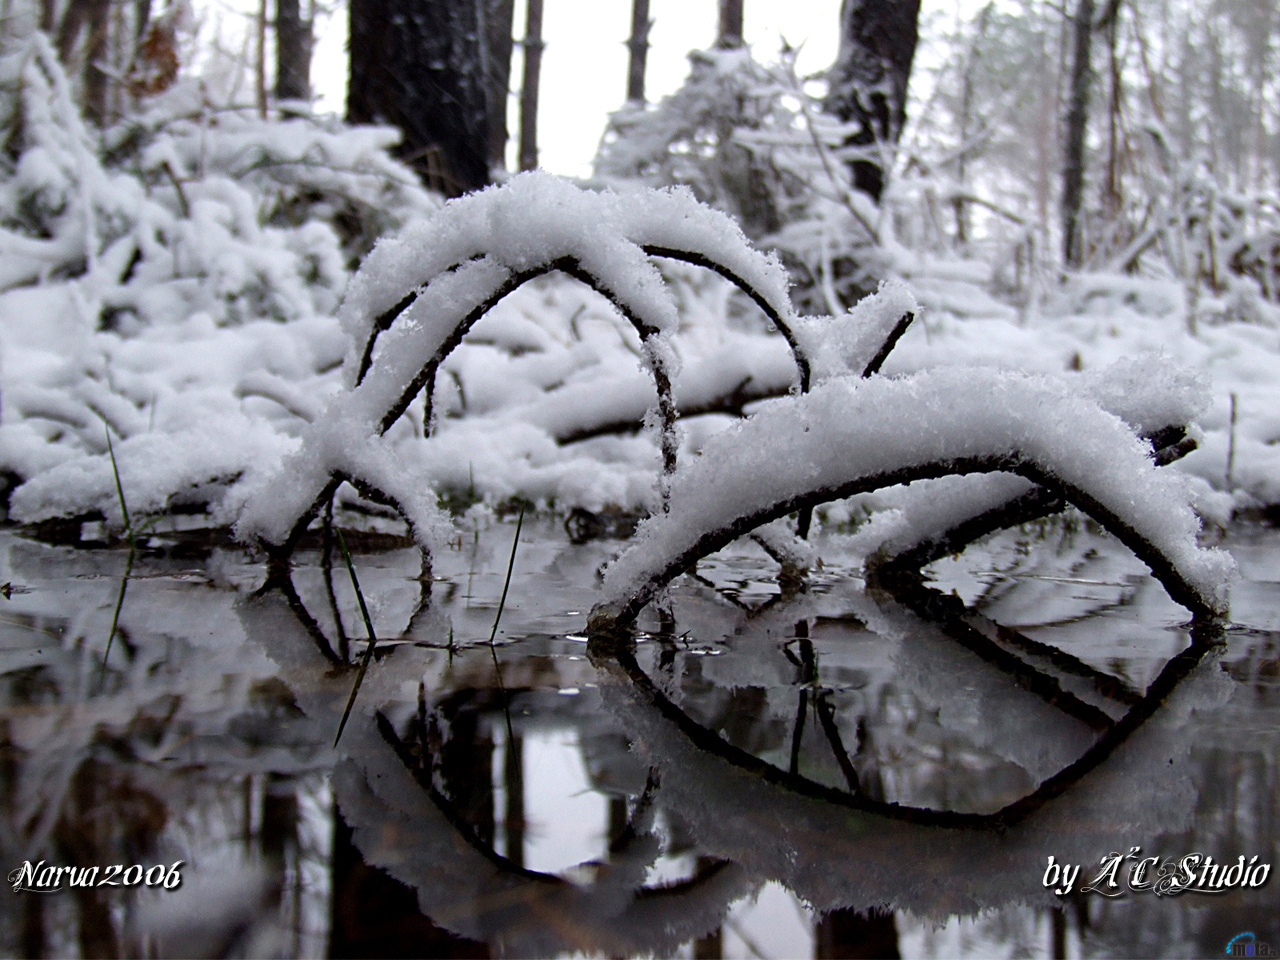 hielo-1280-x-960.jpg